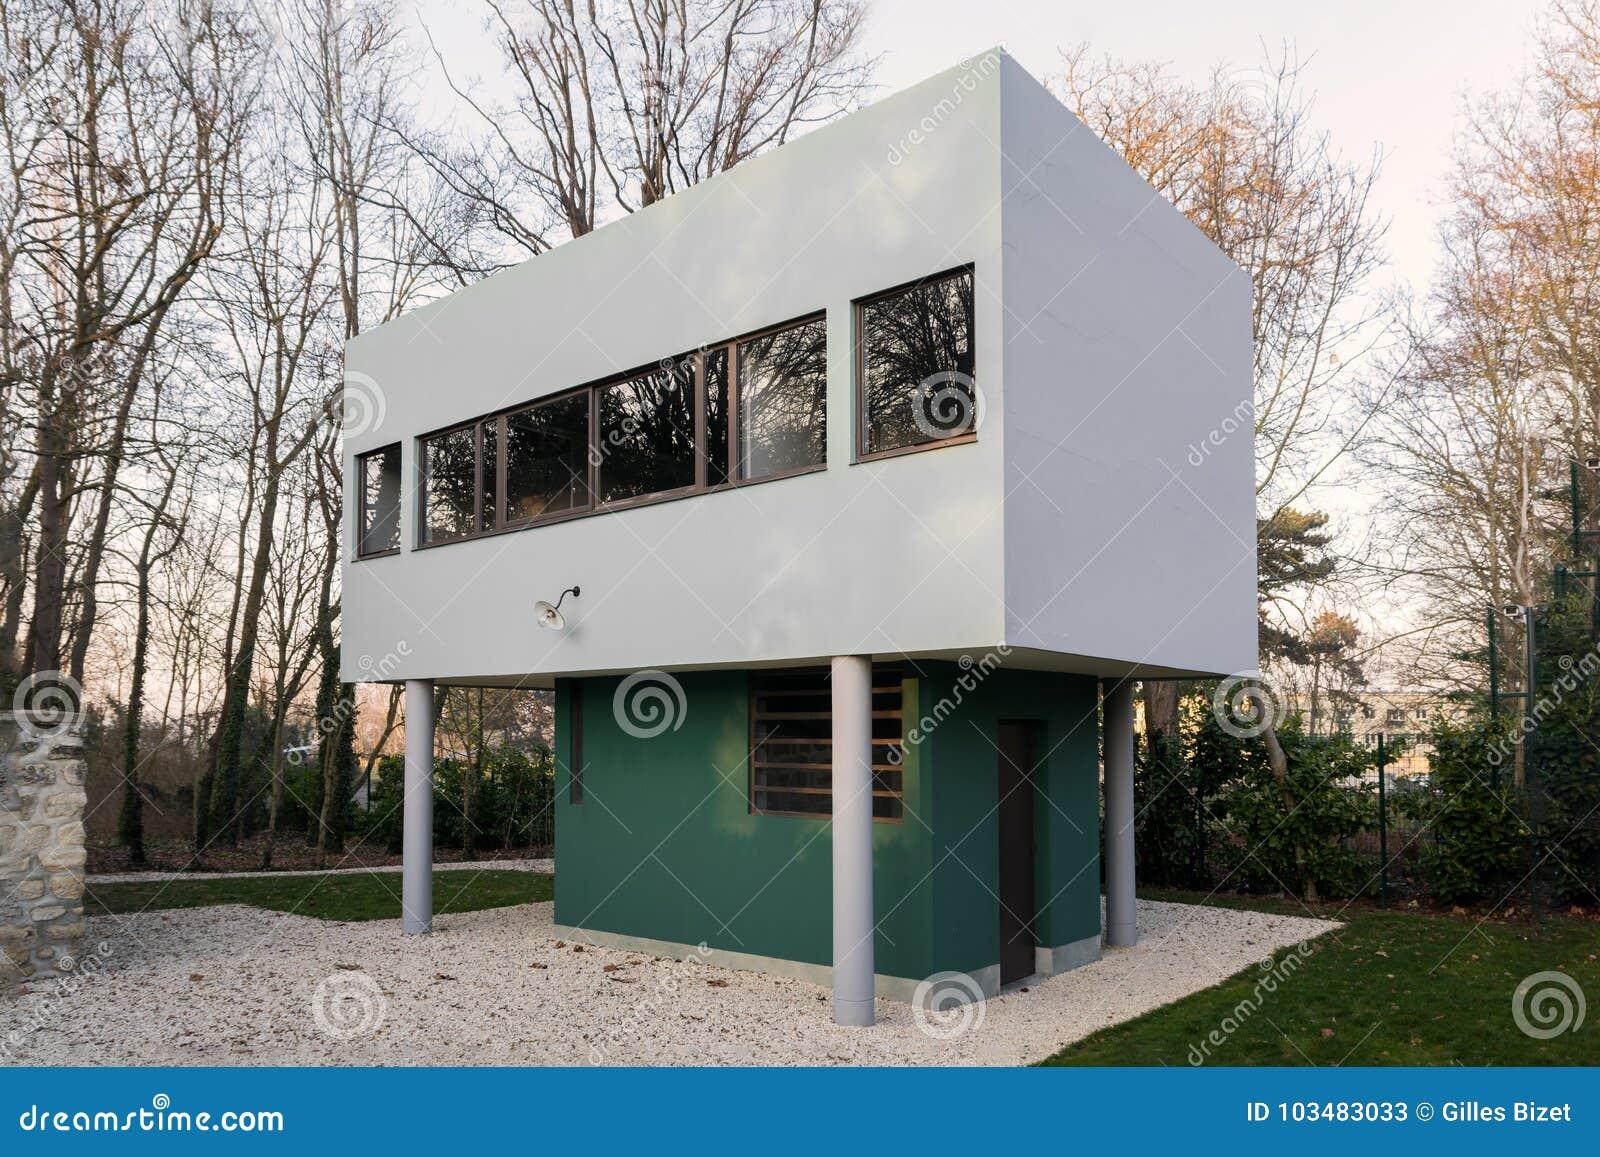 Villa Savoye At Poissy Near Paris Editorial Stock Photo - Image of ...